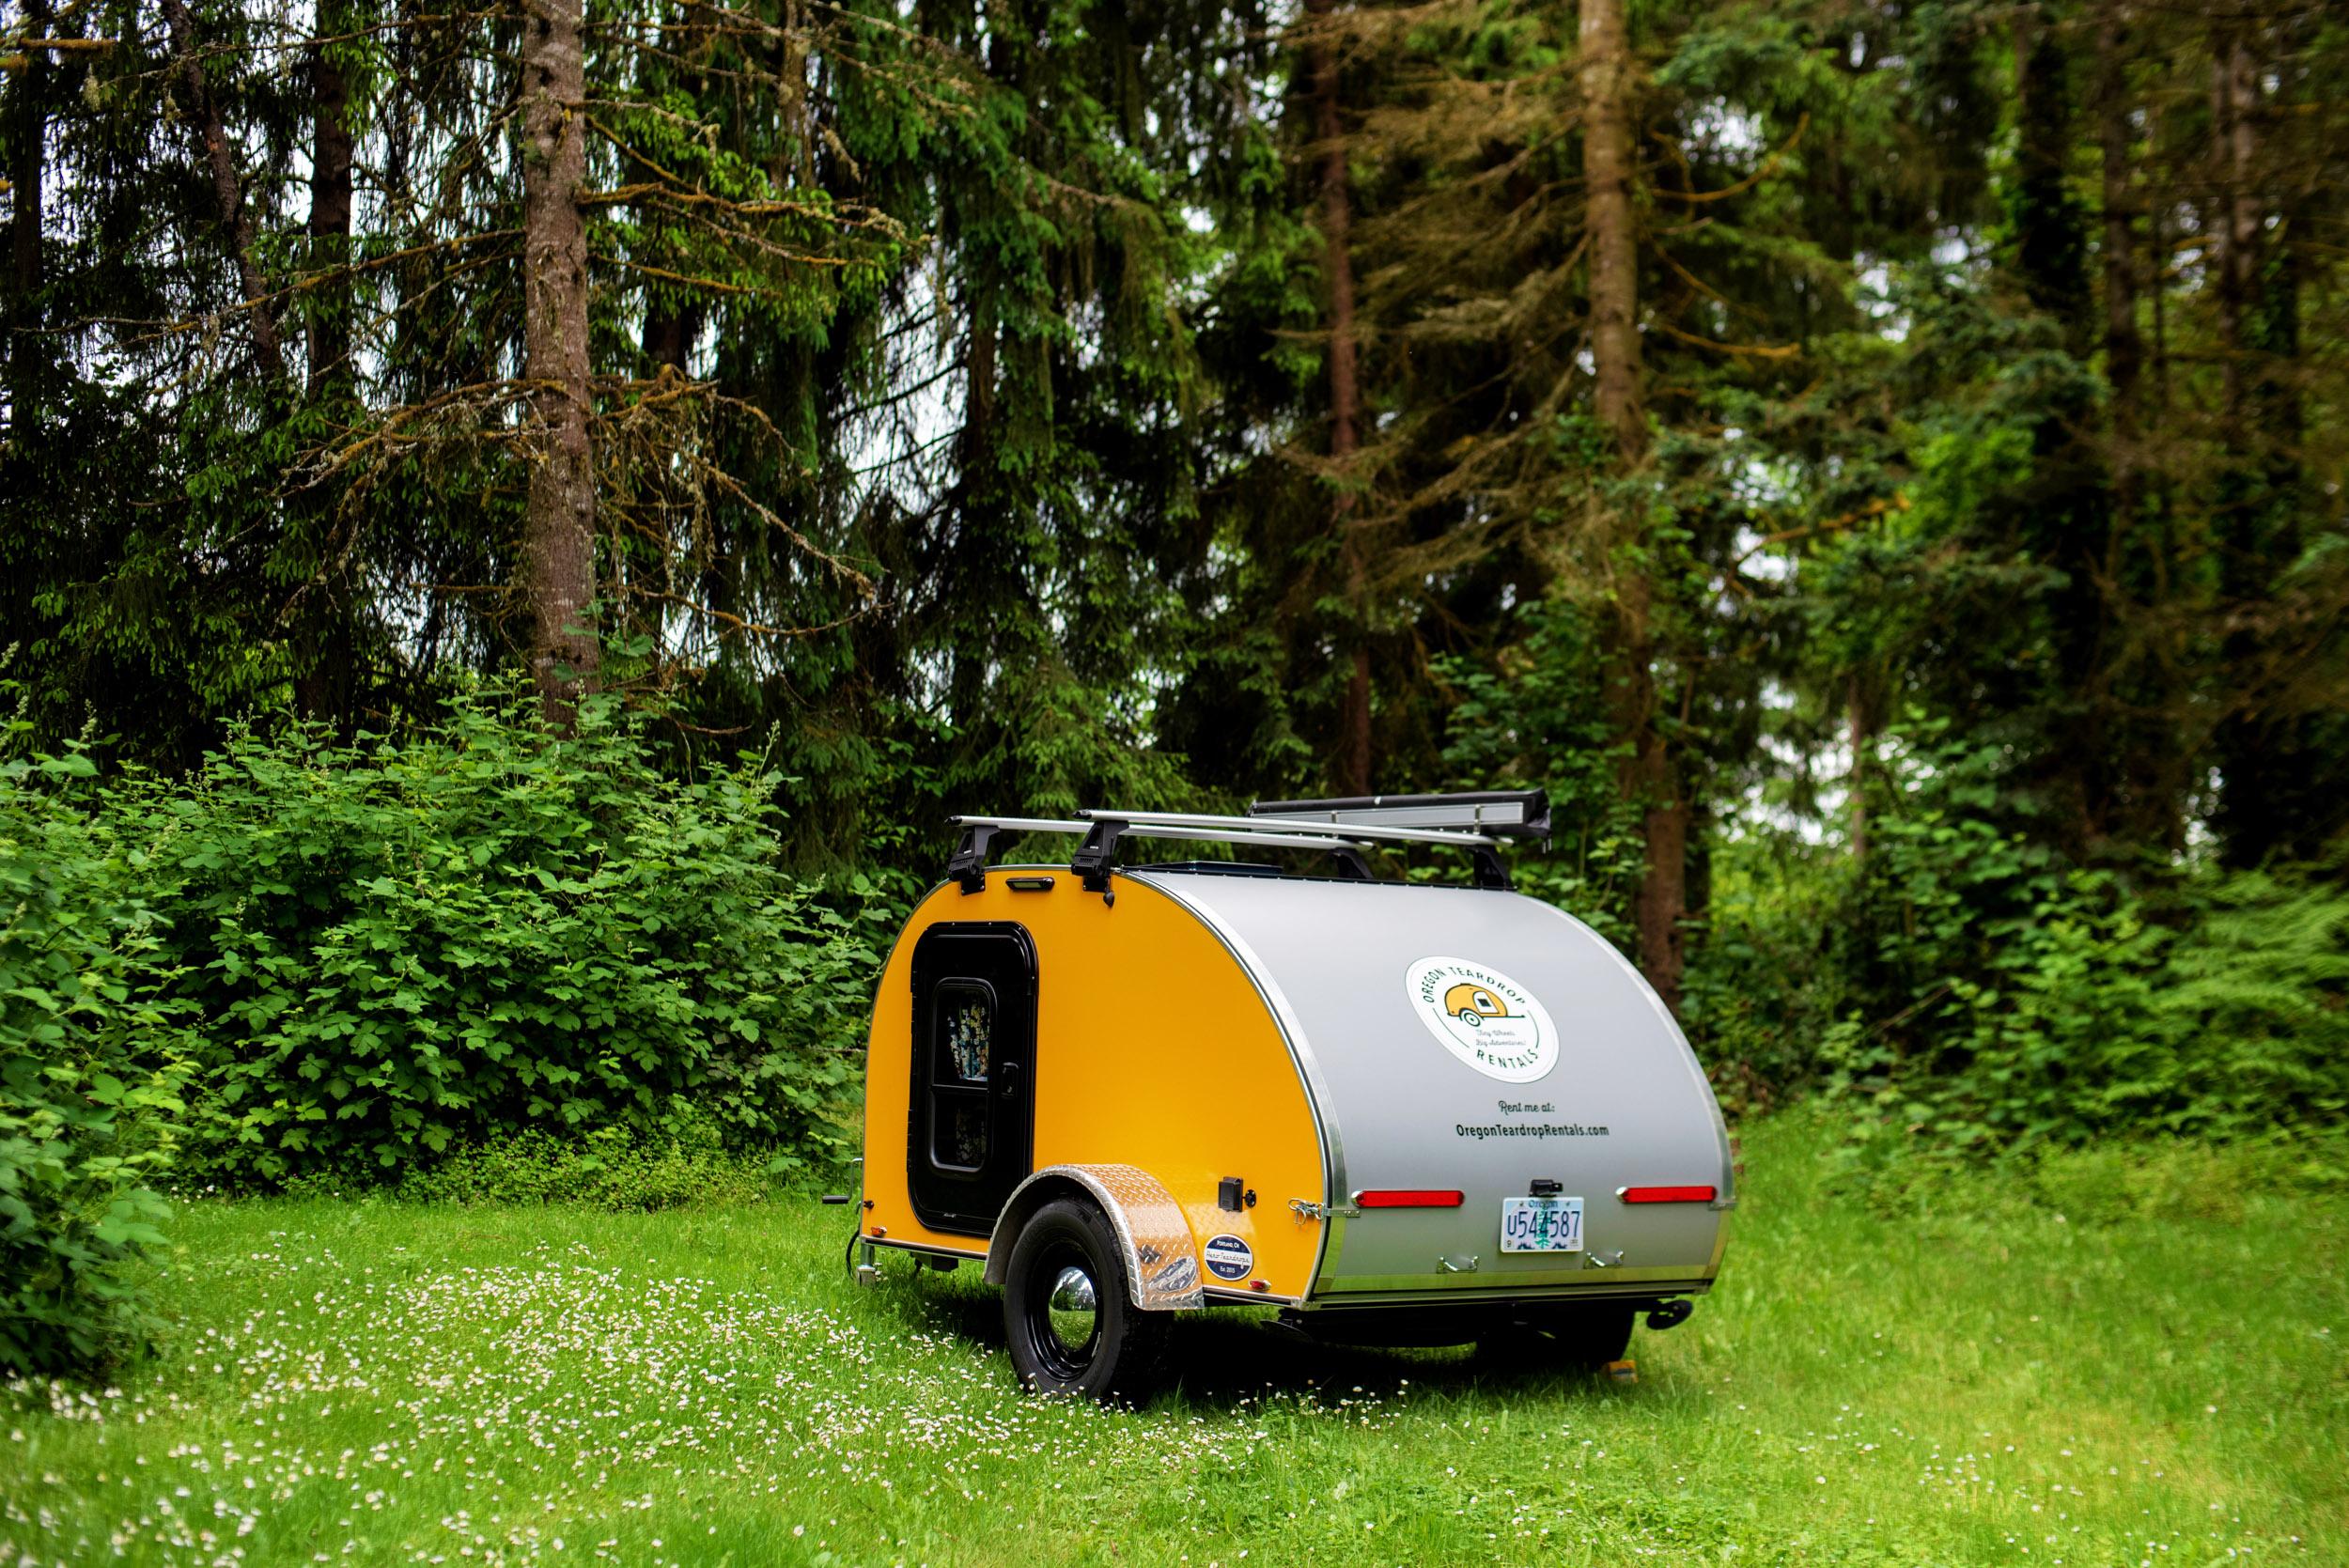 Oregon Teardrop Trailer Camper Pop-up Elopement Wedding